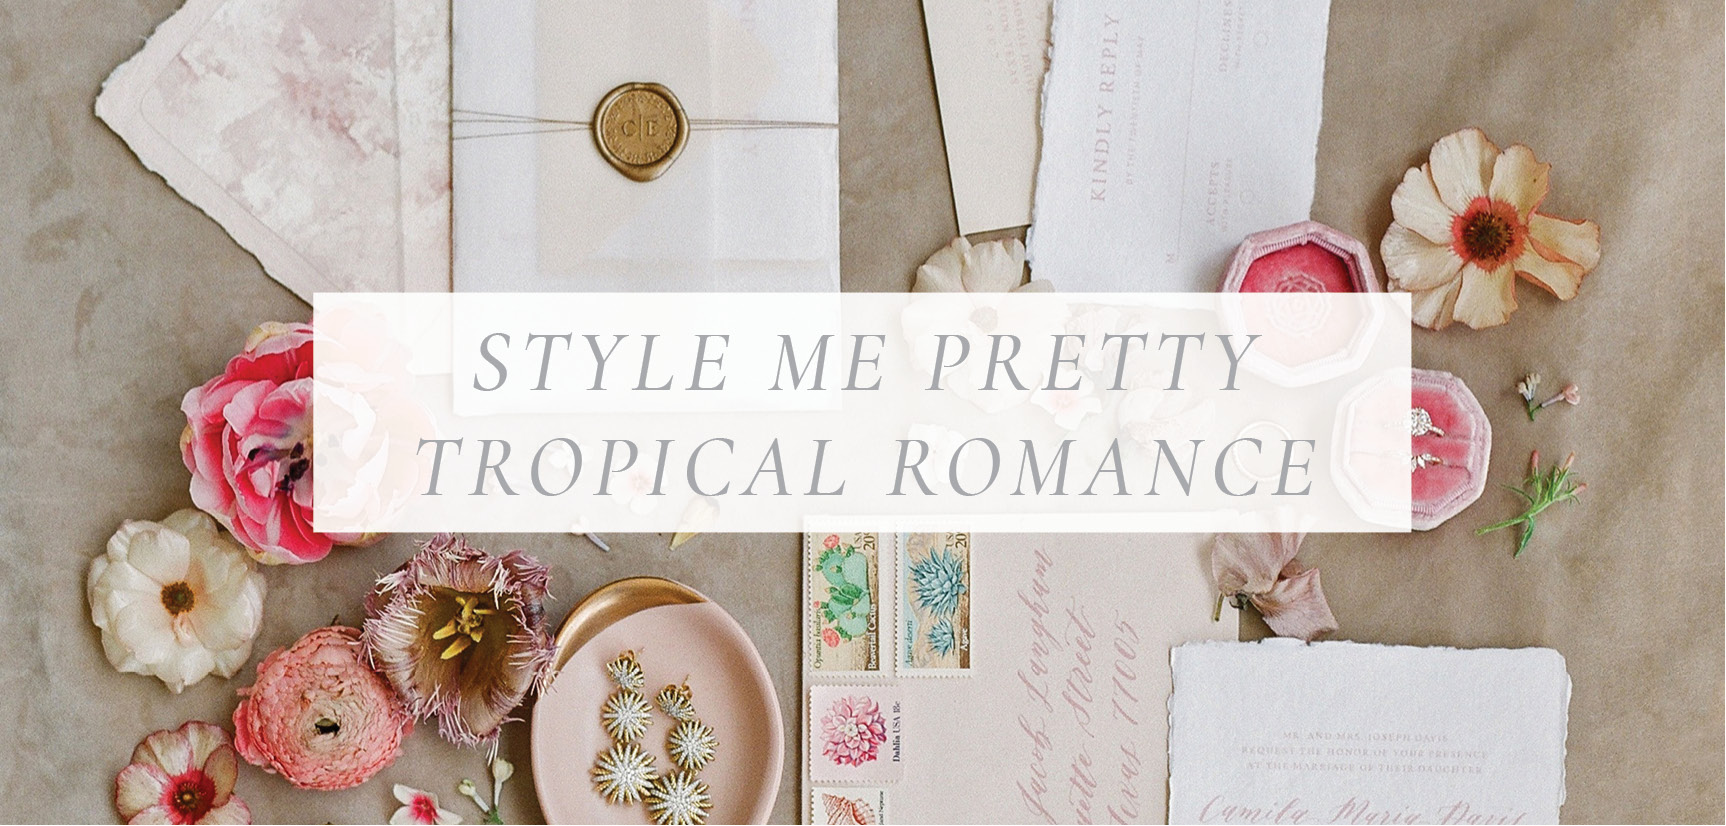 Style Me Pretty_Tropical Romance_Dreams and Nostalgia_Sophie Epton.jpg